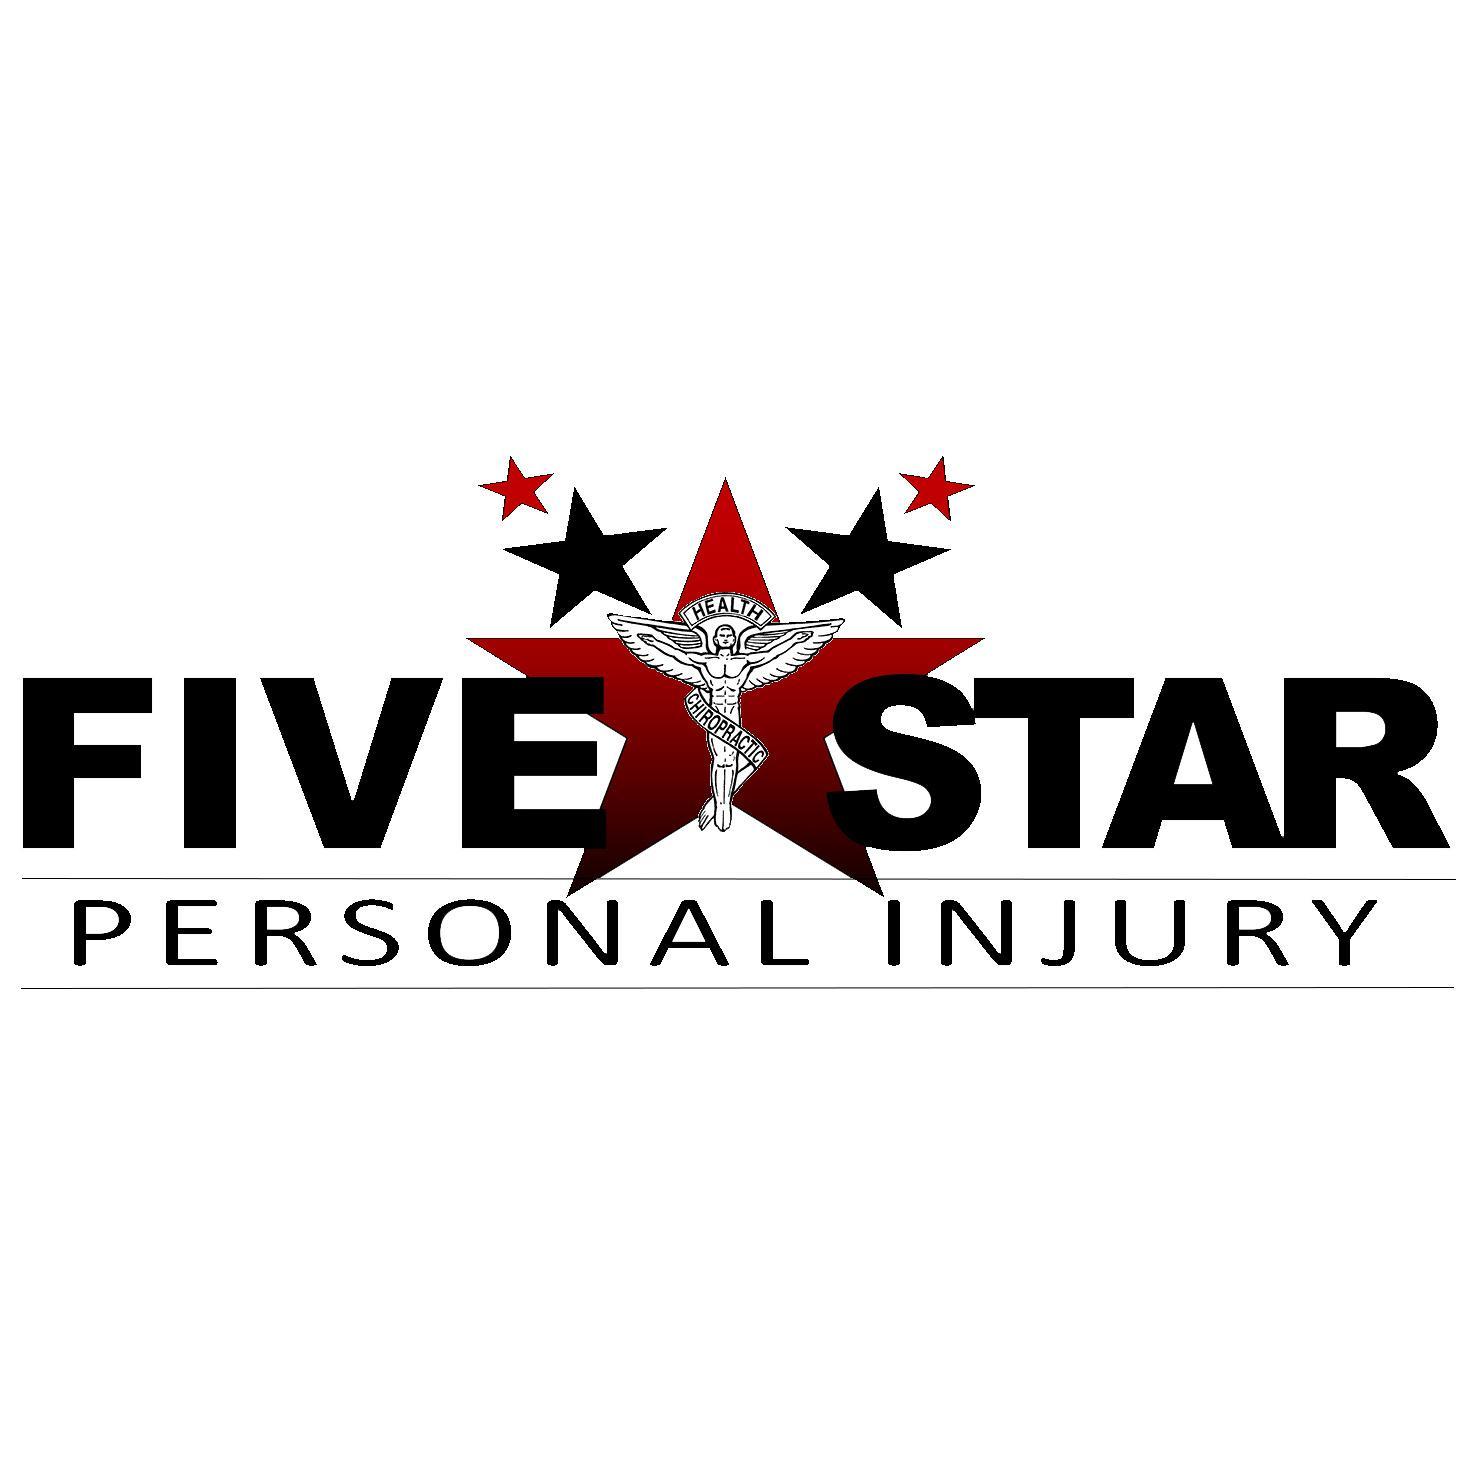 Five Stars Personal Injury